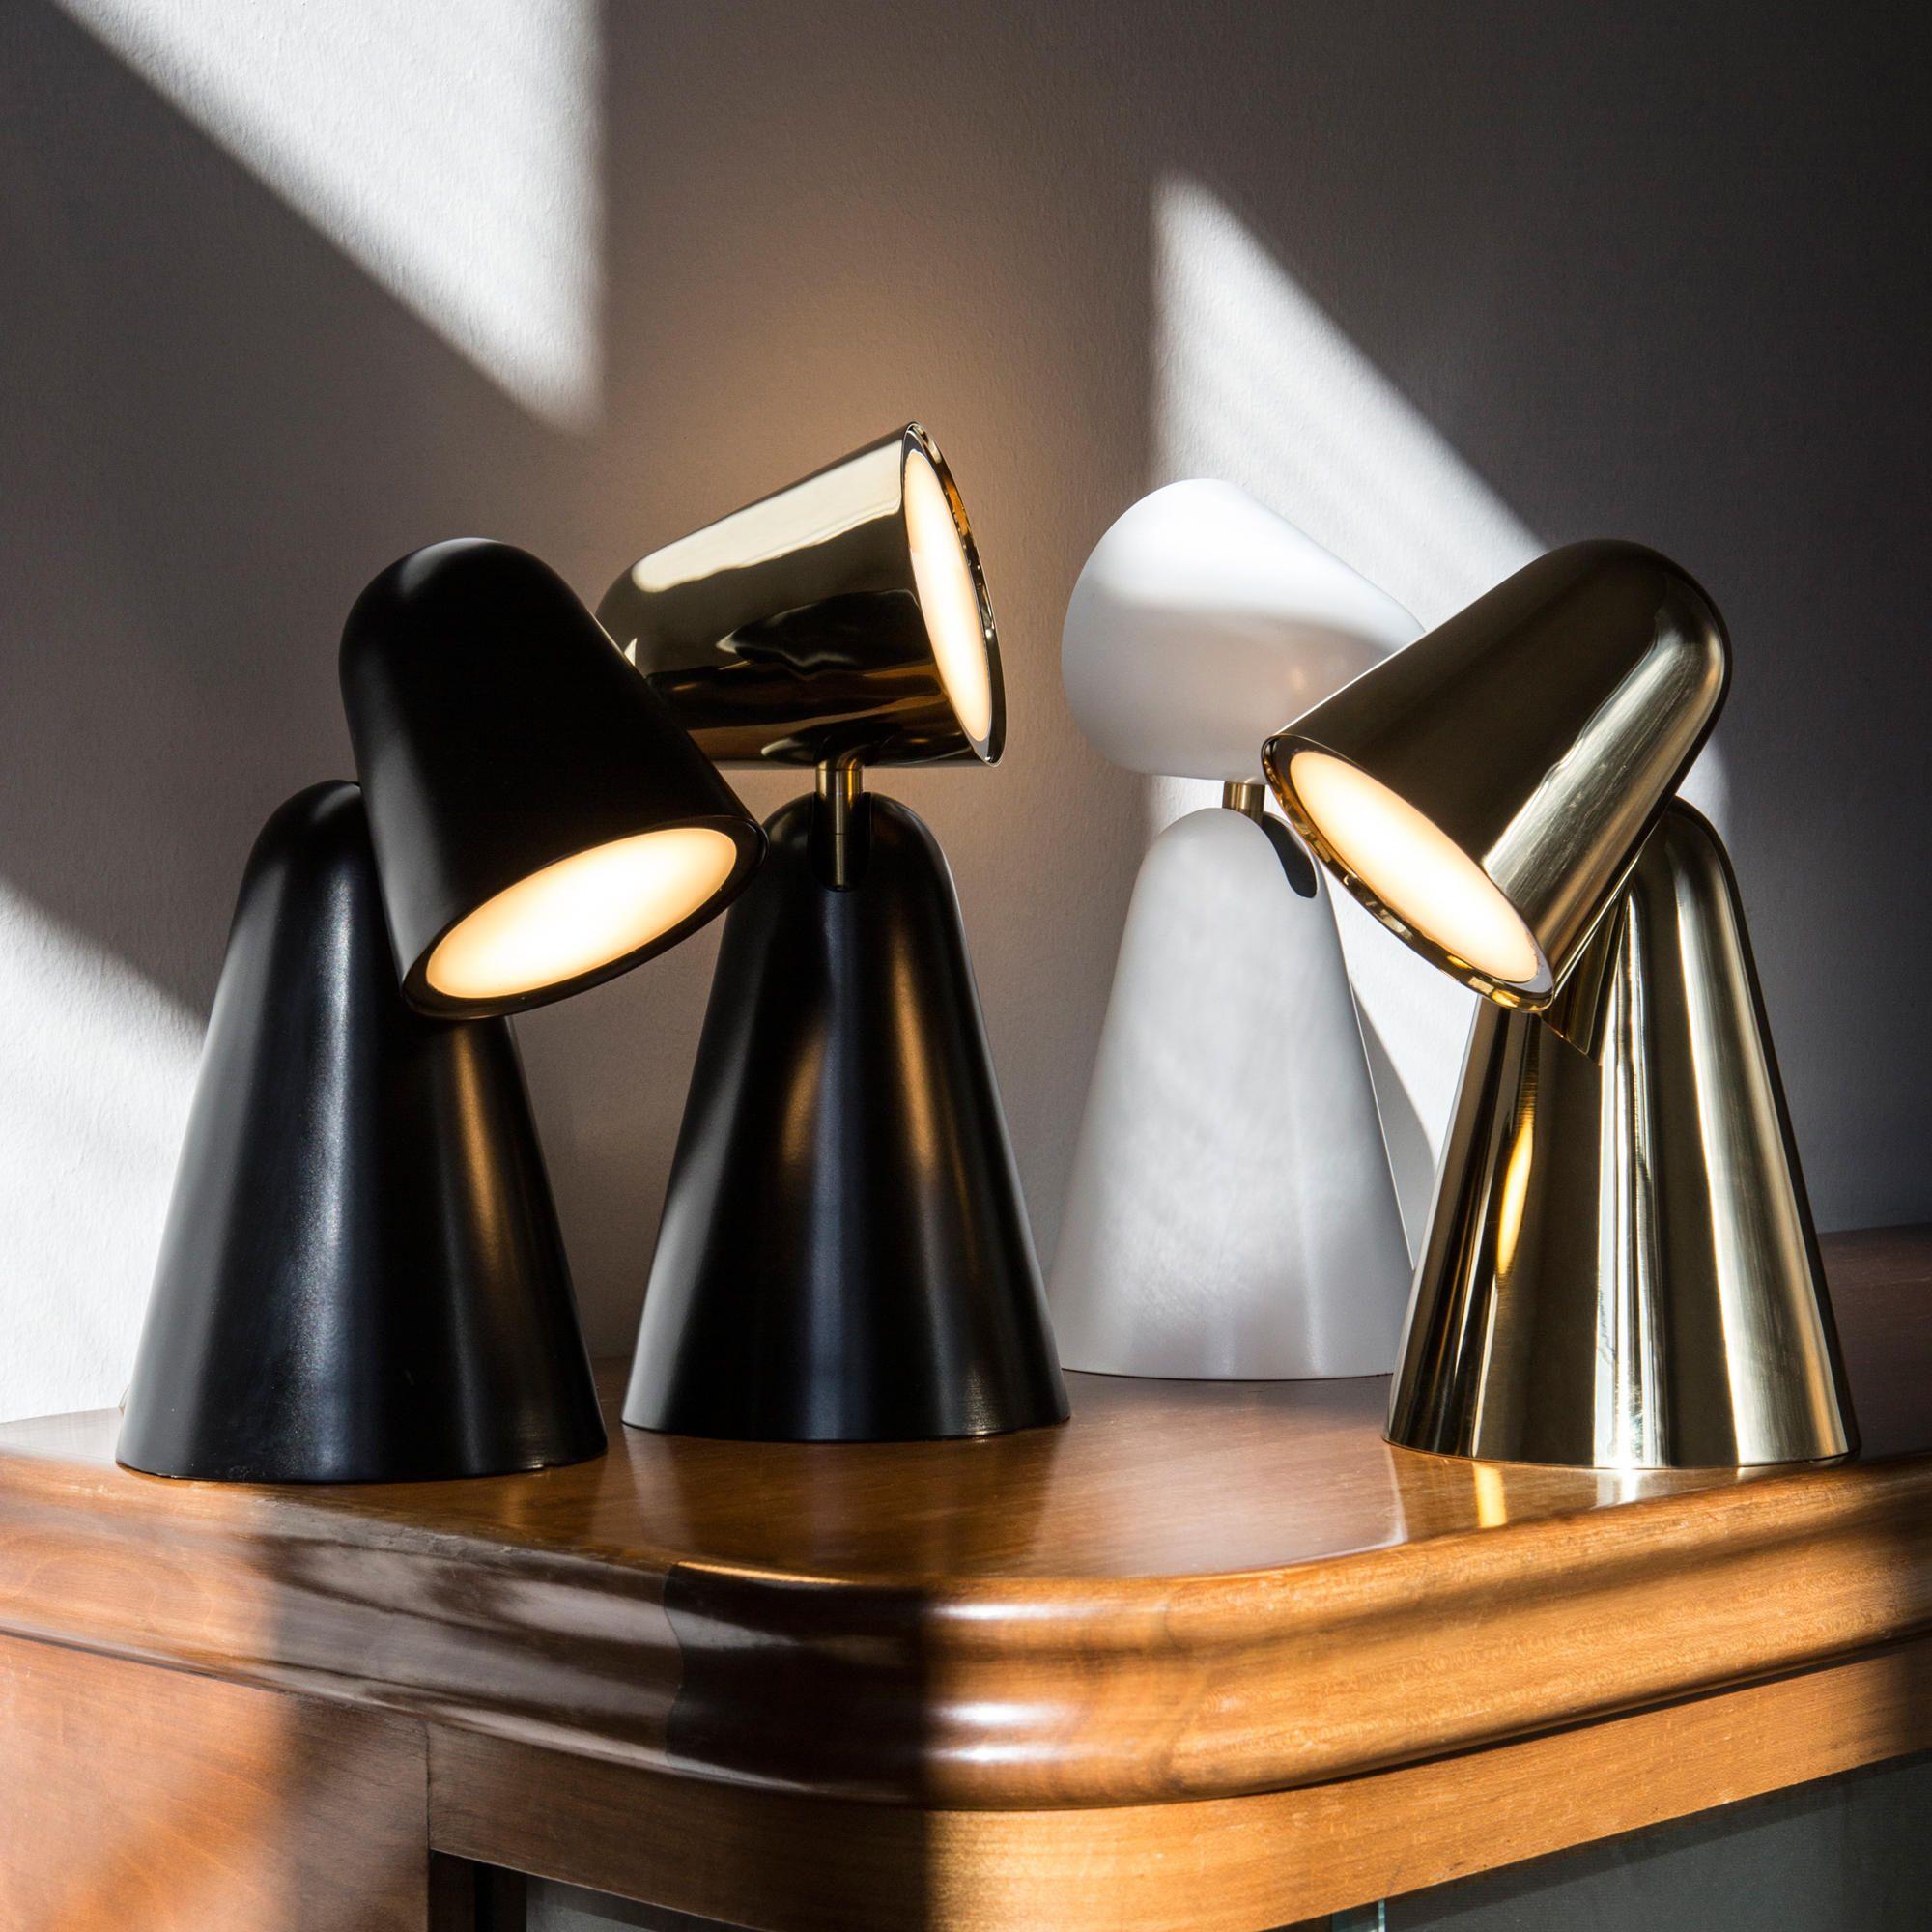 Lampade Da Tavolo Moderne